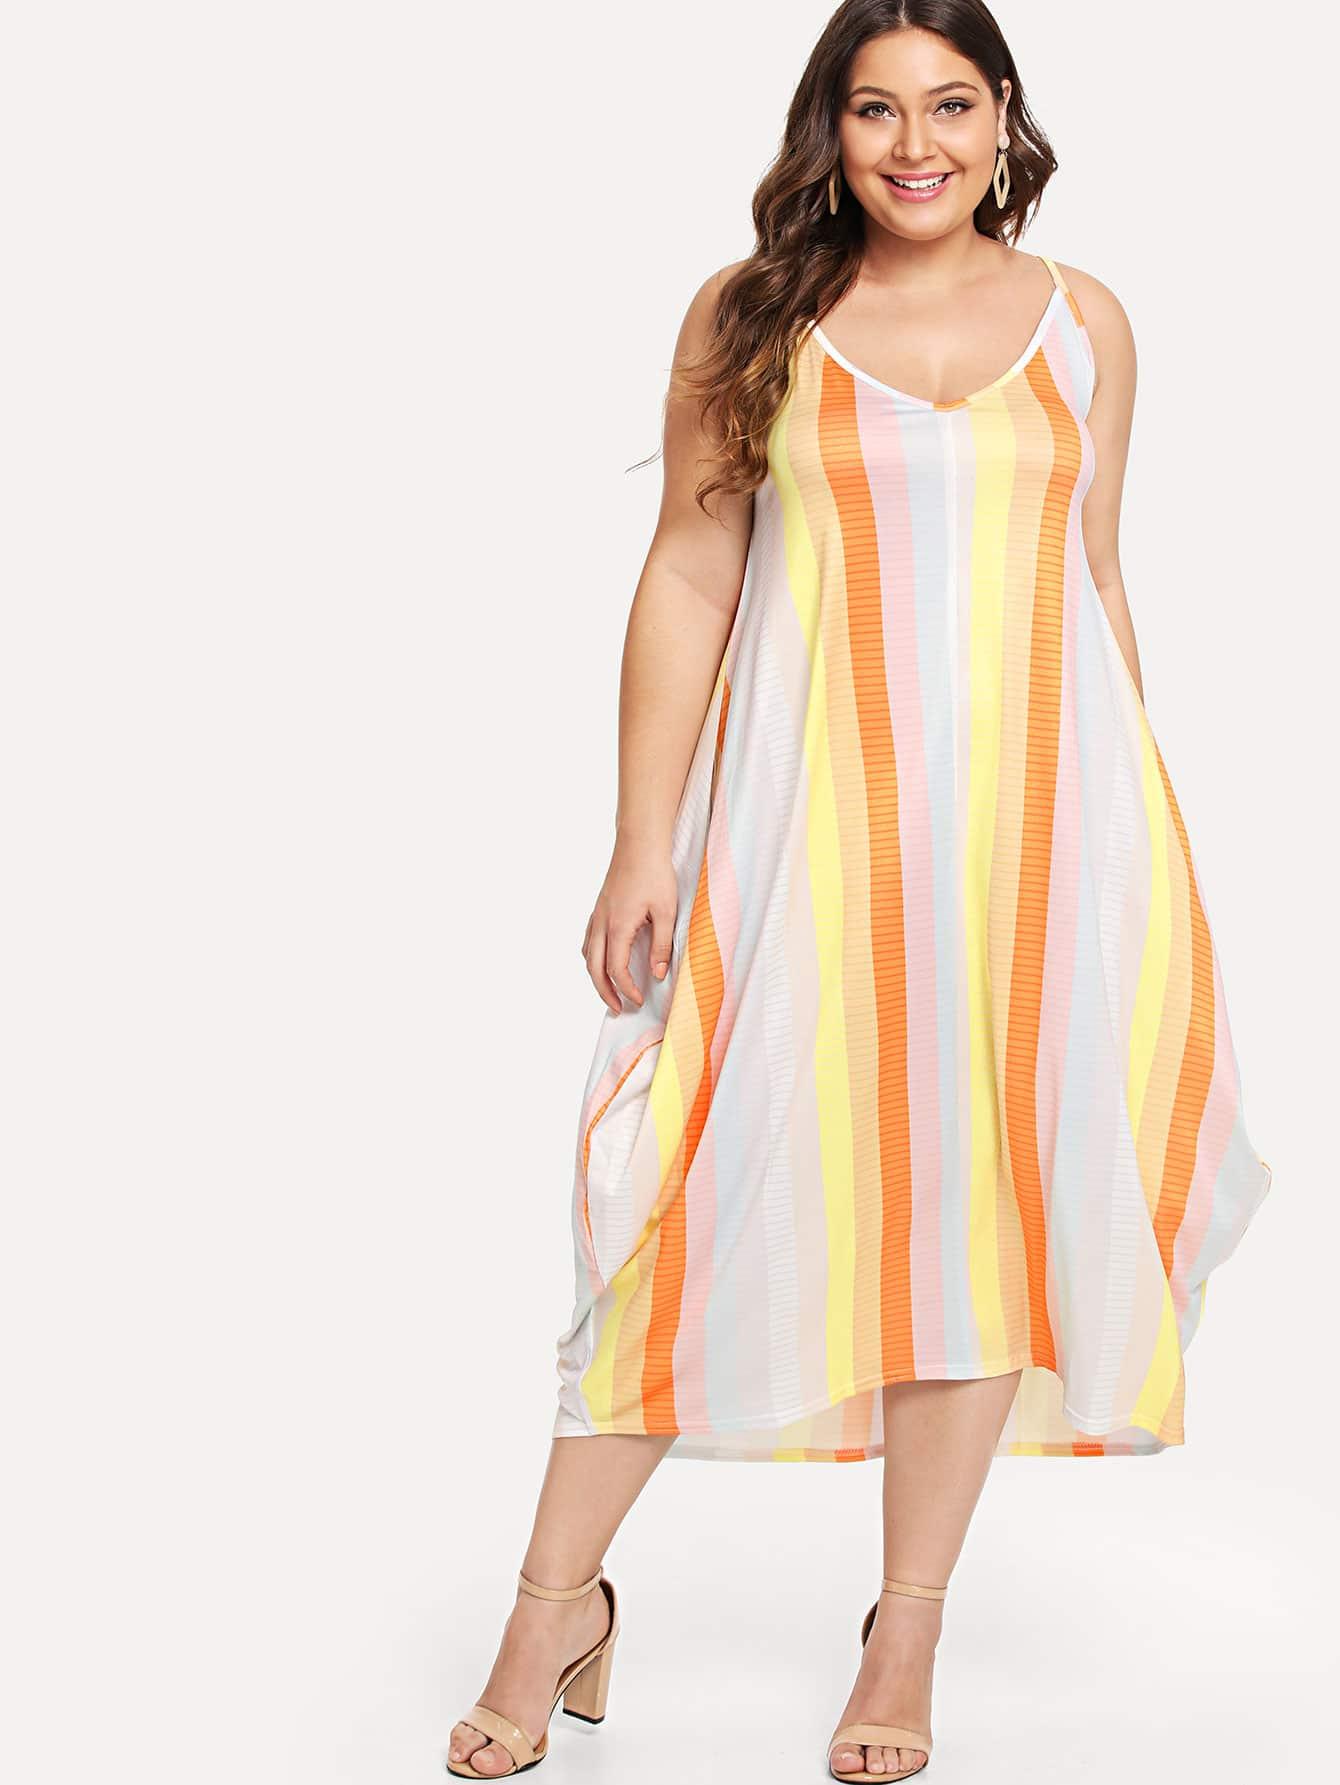 Plus Striped Pocket Side Cami Dress b173rw01 v 5 v 2 v 4 v 0 v 1 fit lp173wd1 tl a1 ltn173kt02 n173fge l21 l23 ltn173kt01 k01 n173o6 l02 rev c1 40 pin